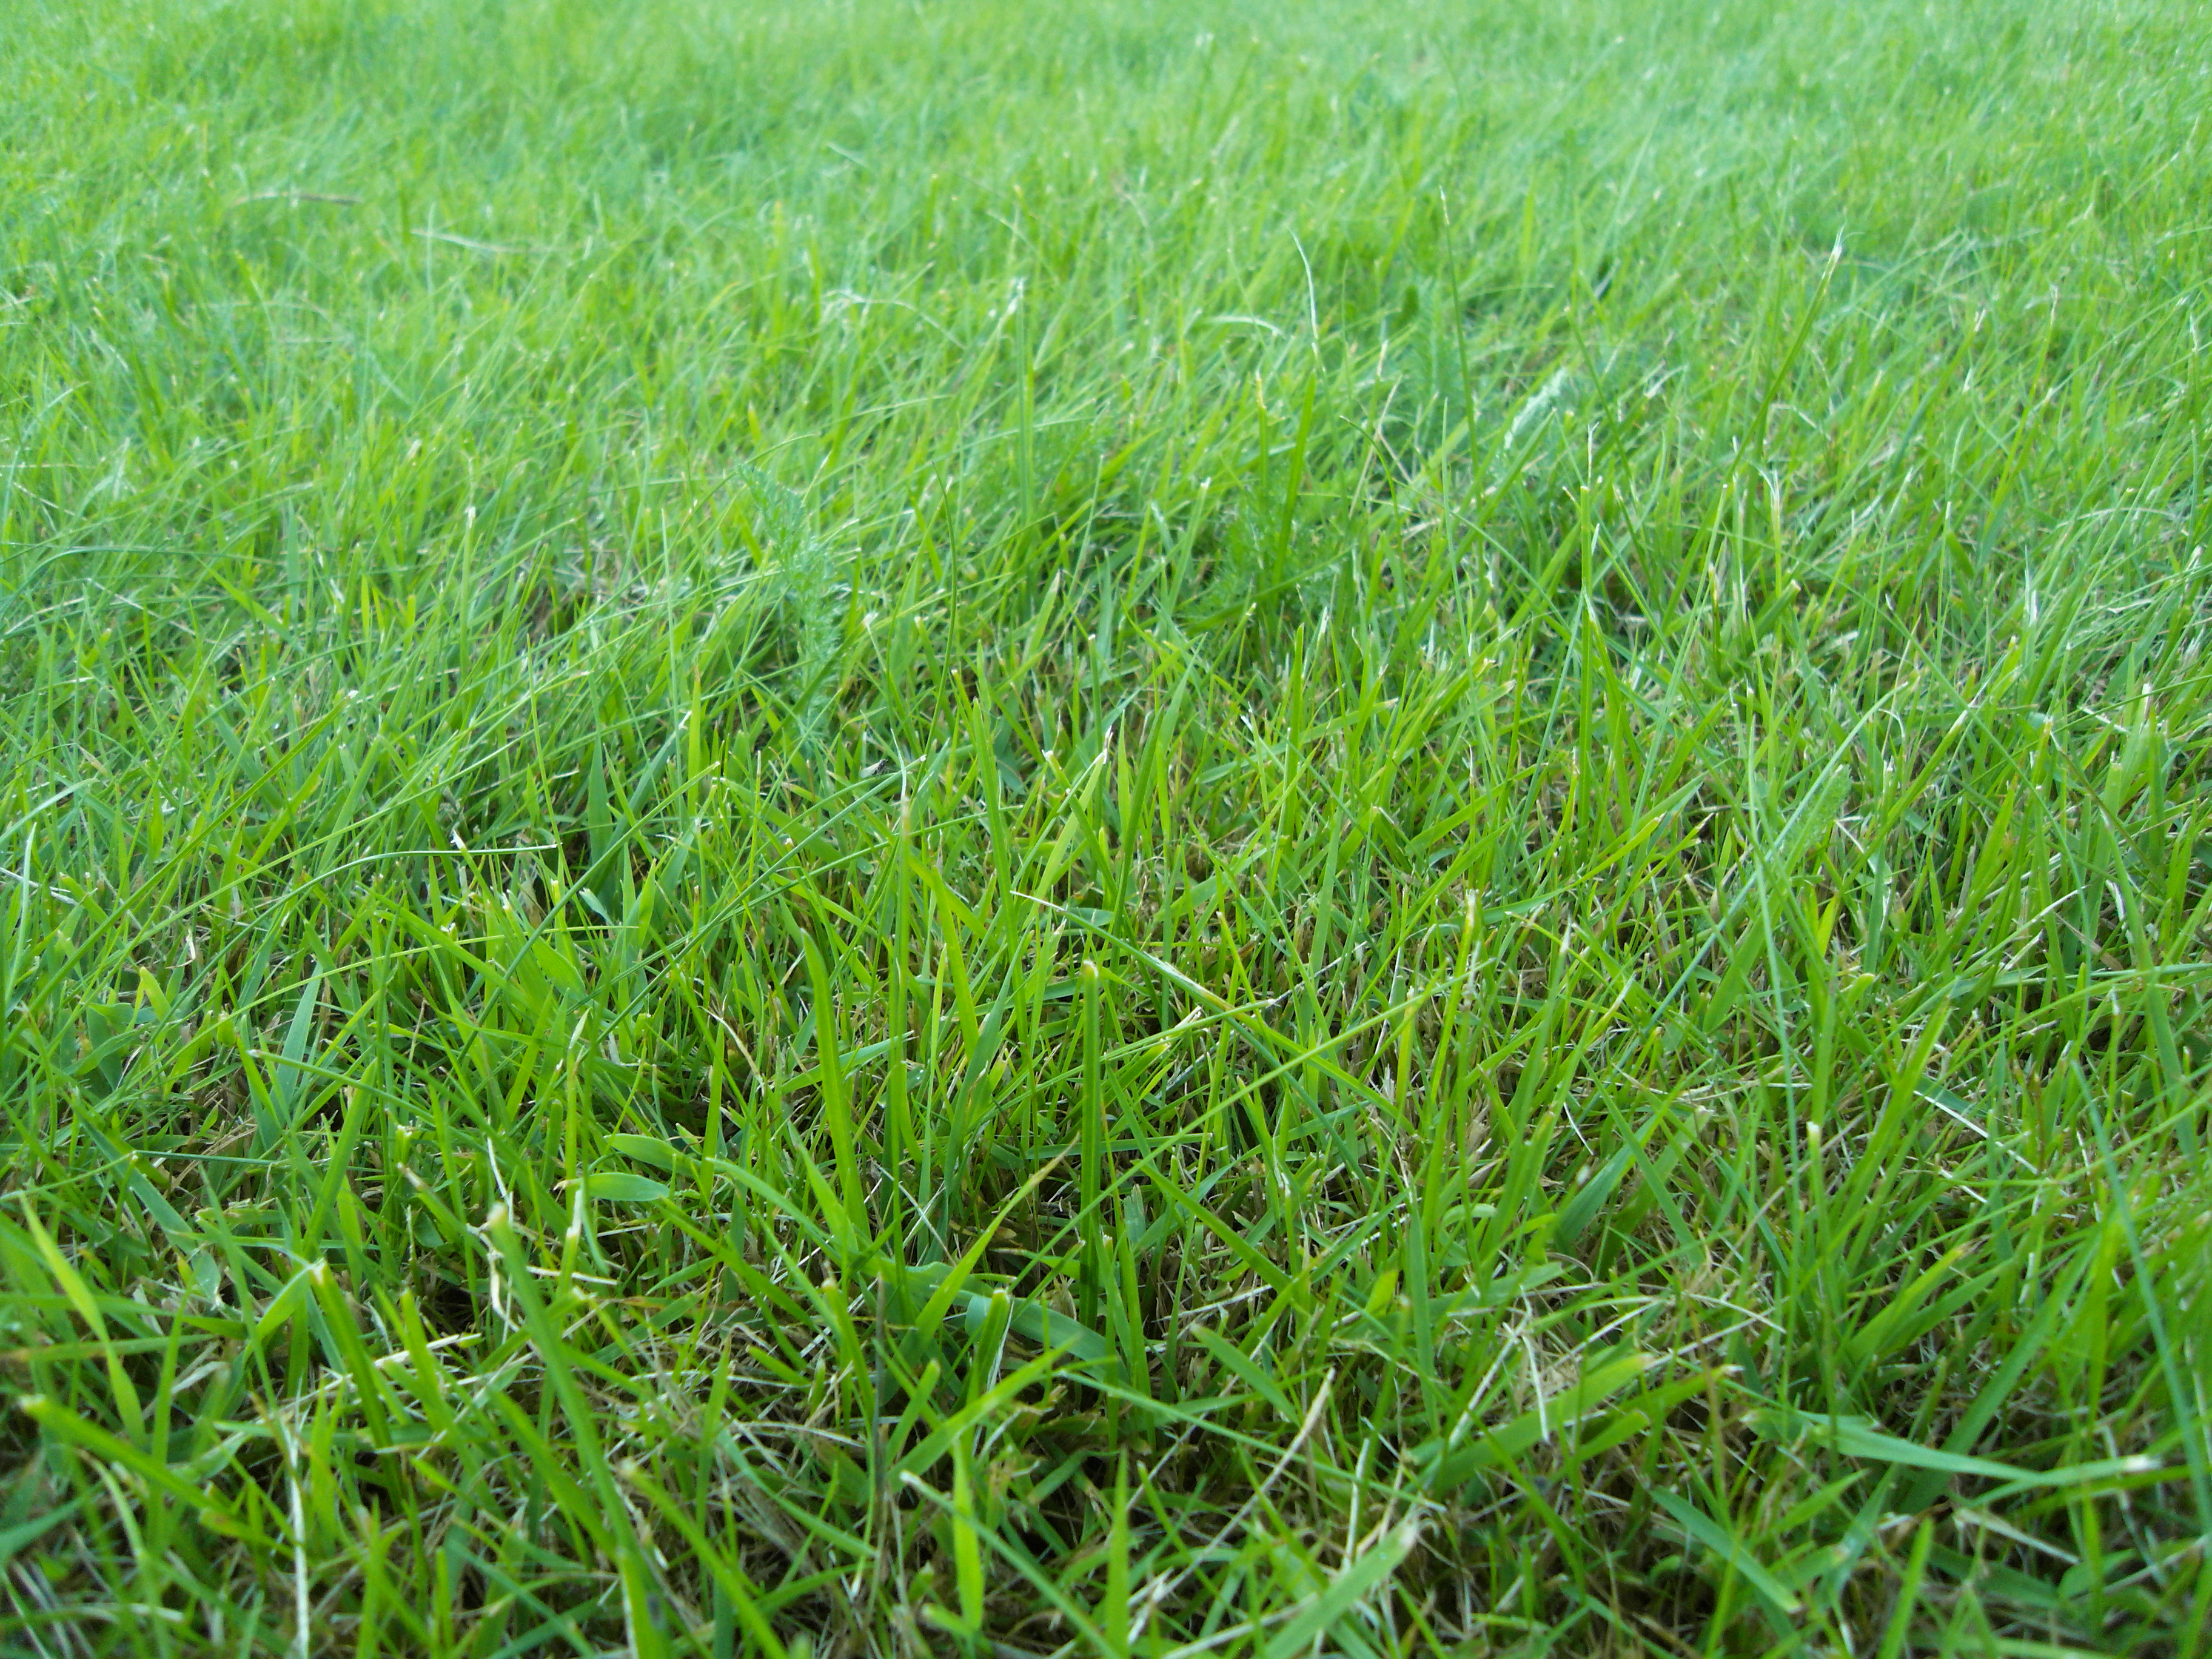 File:Grass, summer 2012.JPG - Wikimedia Commons